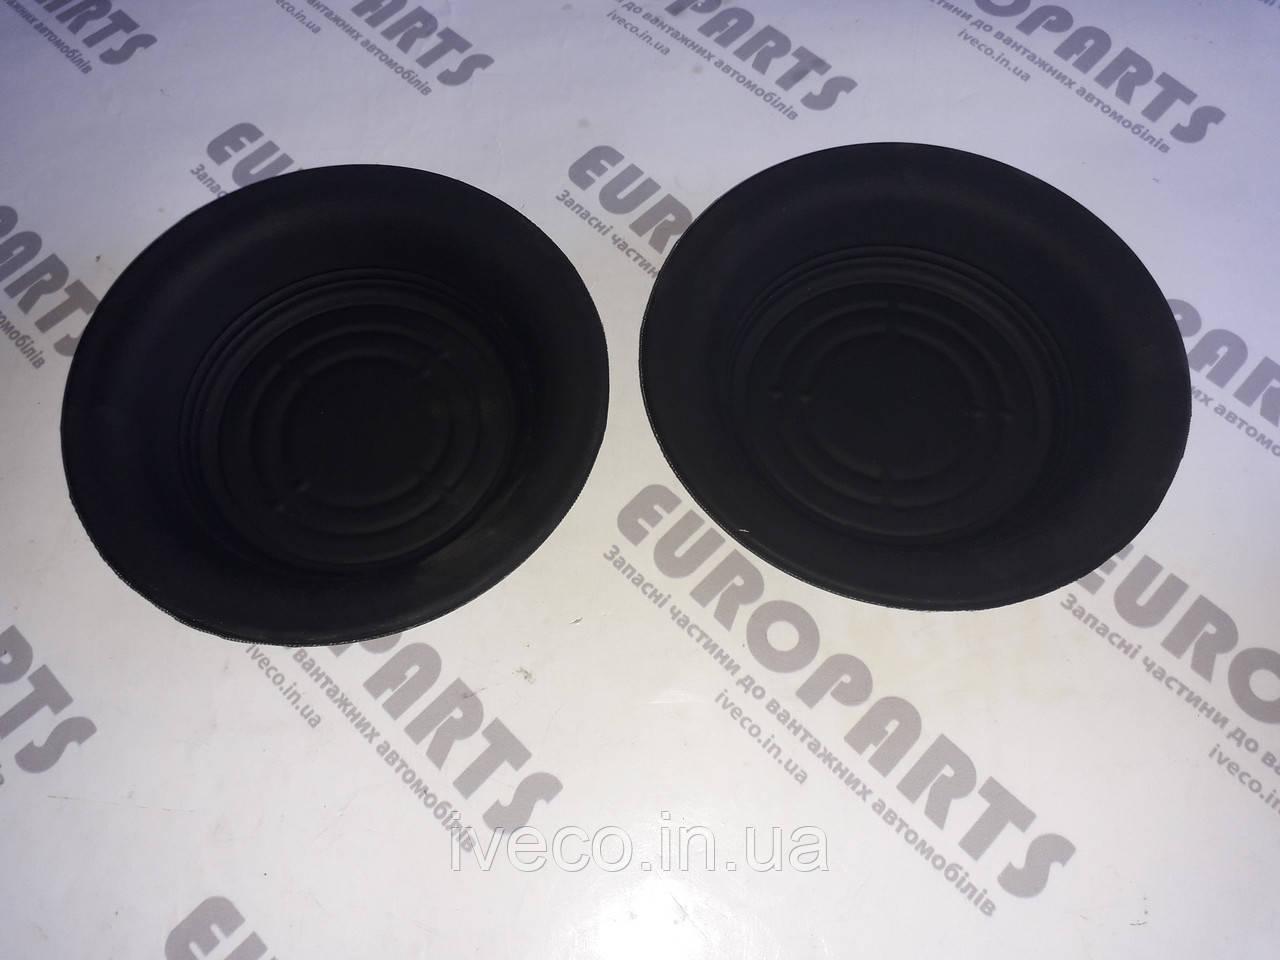 Диафрагма камеры тормозной резина T24 мелкая 8971205304 0220007090 0004212086 , фото 1